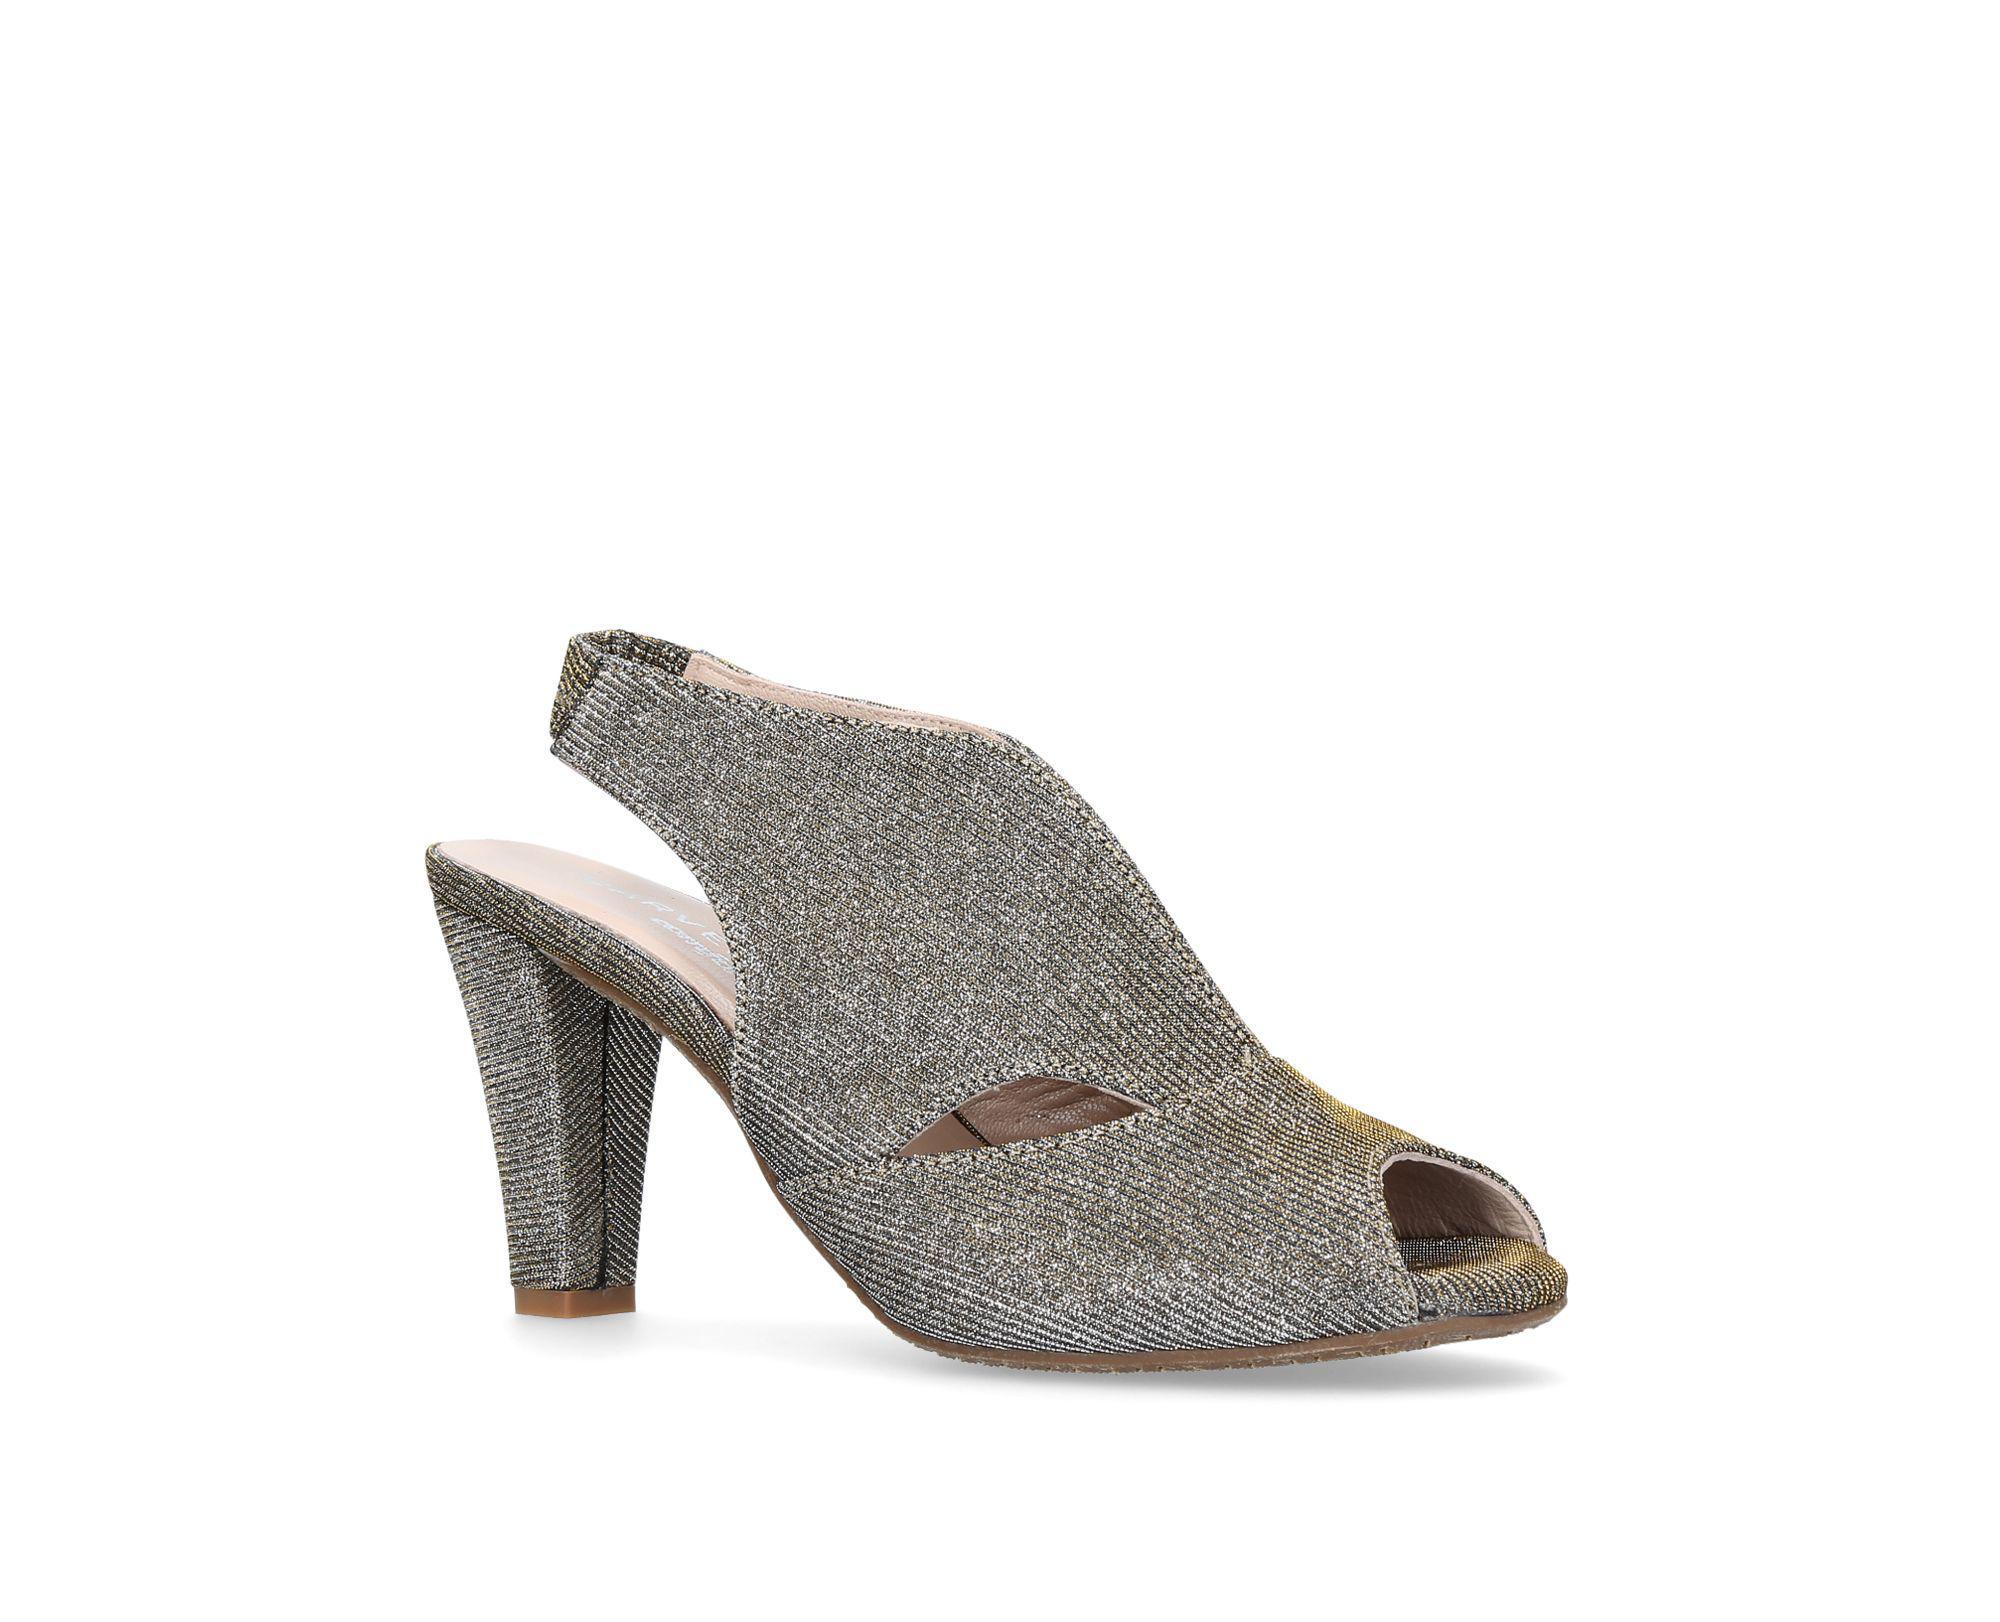 8ebd436955 Carvela Kurt Geiger Metallic 'arabella' Mid Heel Sandals in Metallic ...